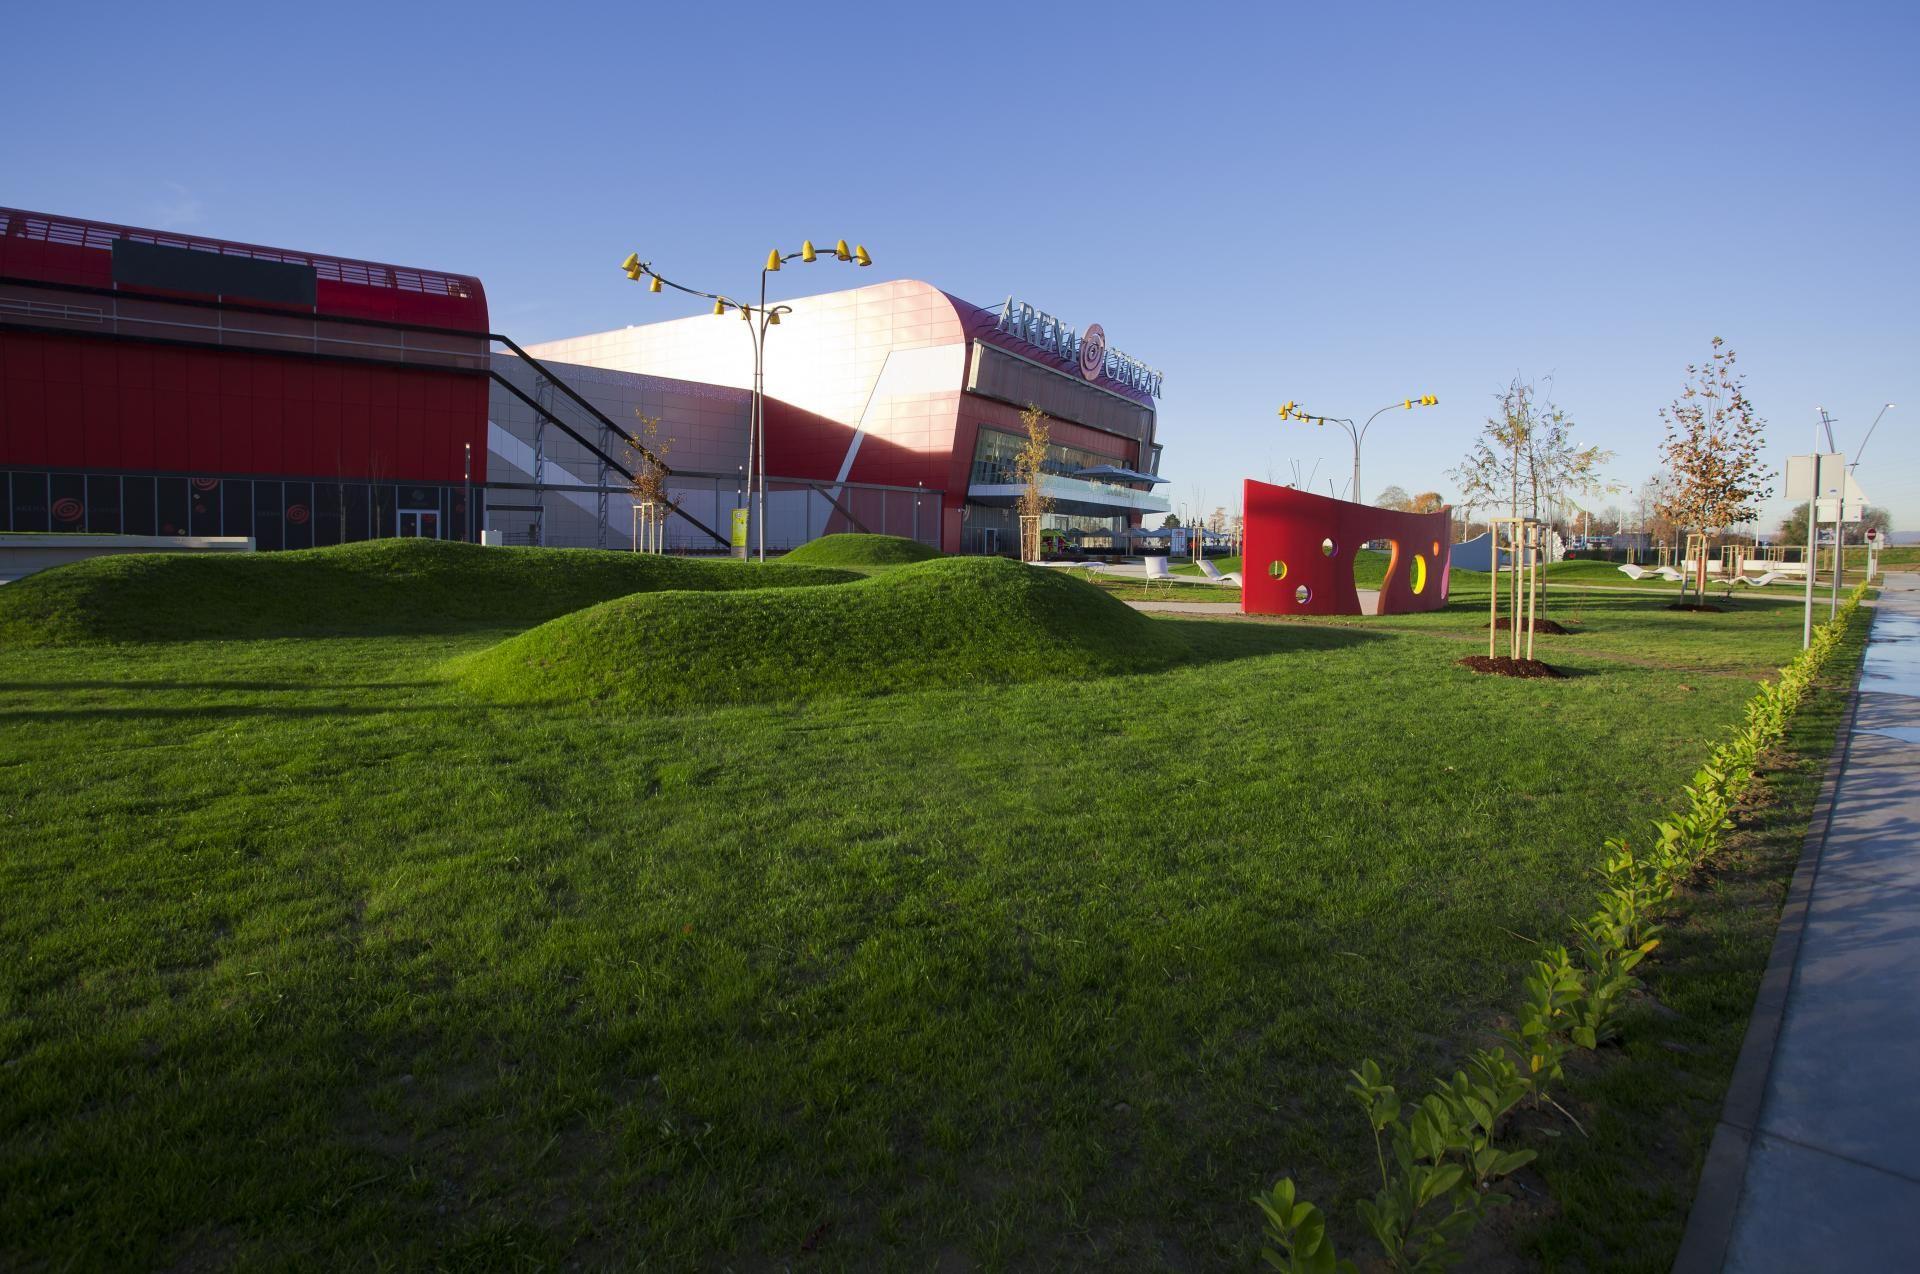 Arena Centar Commercial Center With Unique Landscape Deisgn By Upi 2m Zagreb Croatia Landscape Arena Image